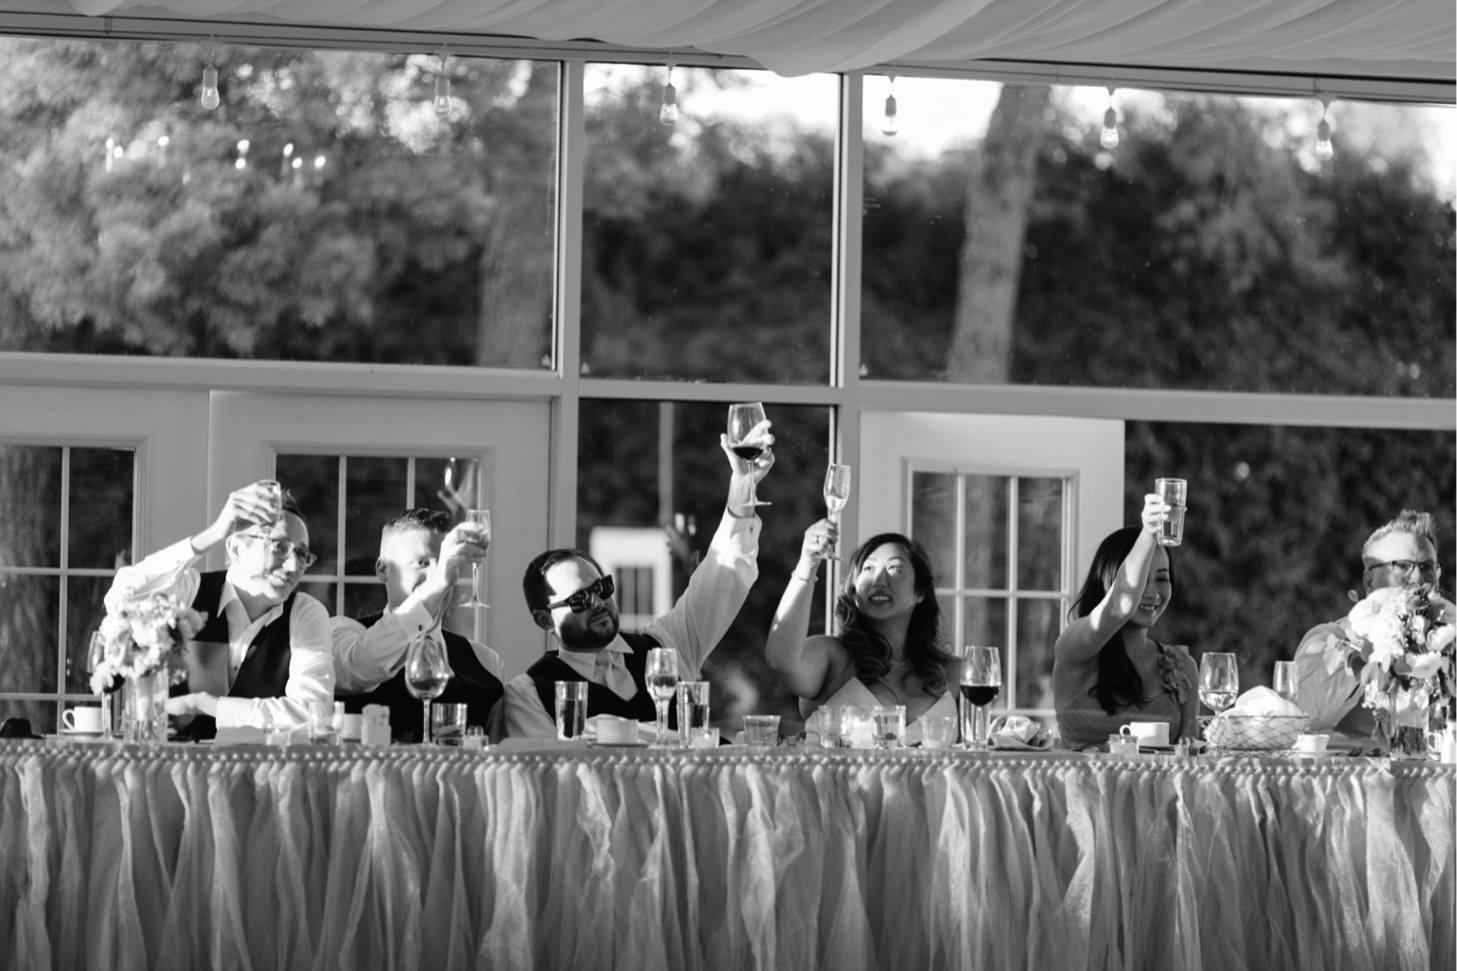 ritz-charles-wedding-reception-downtown-indianapolis-wedding-photographer046.JPG